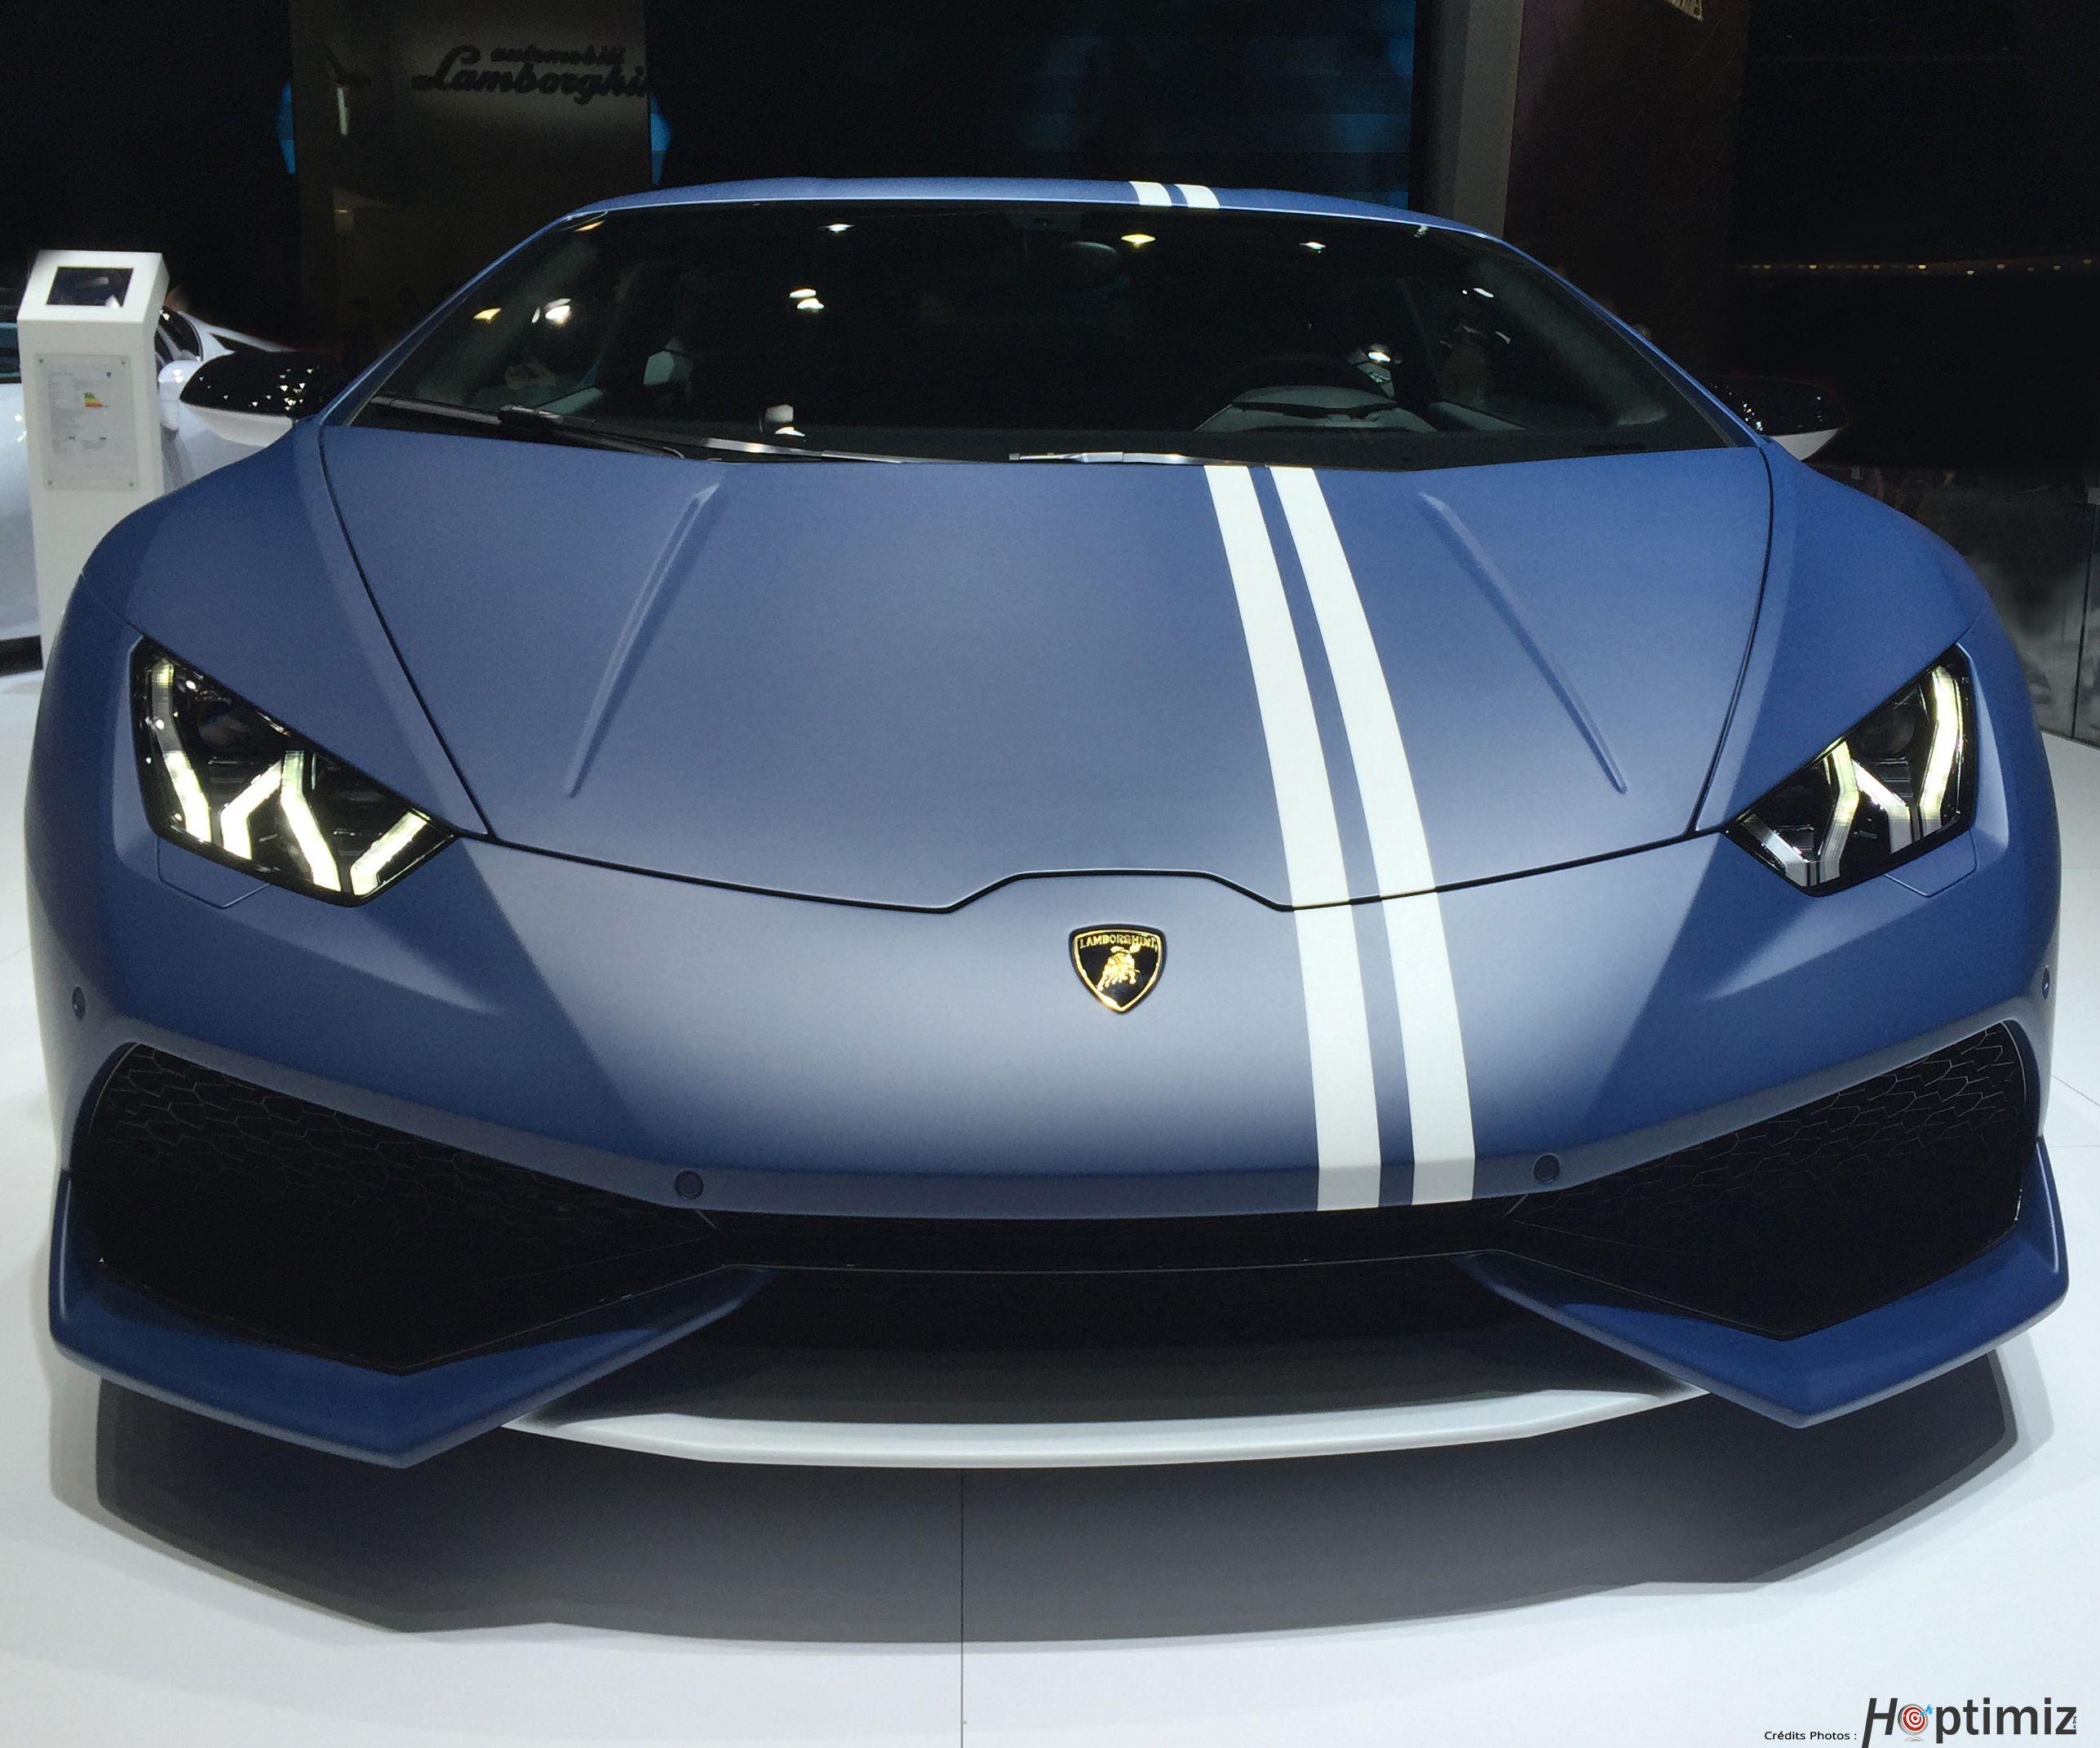 728c0c51922537bb484b8b7414a235ca Marvelous Lamborghini Huracan Price In Uae Cars Trend